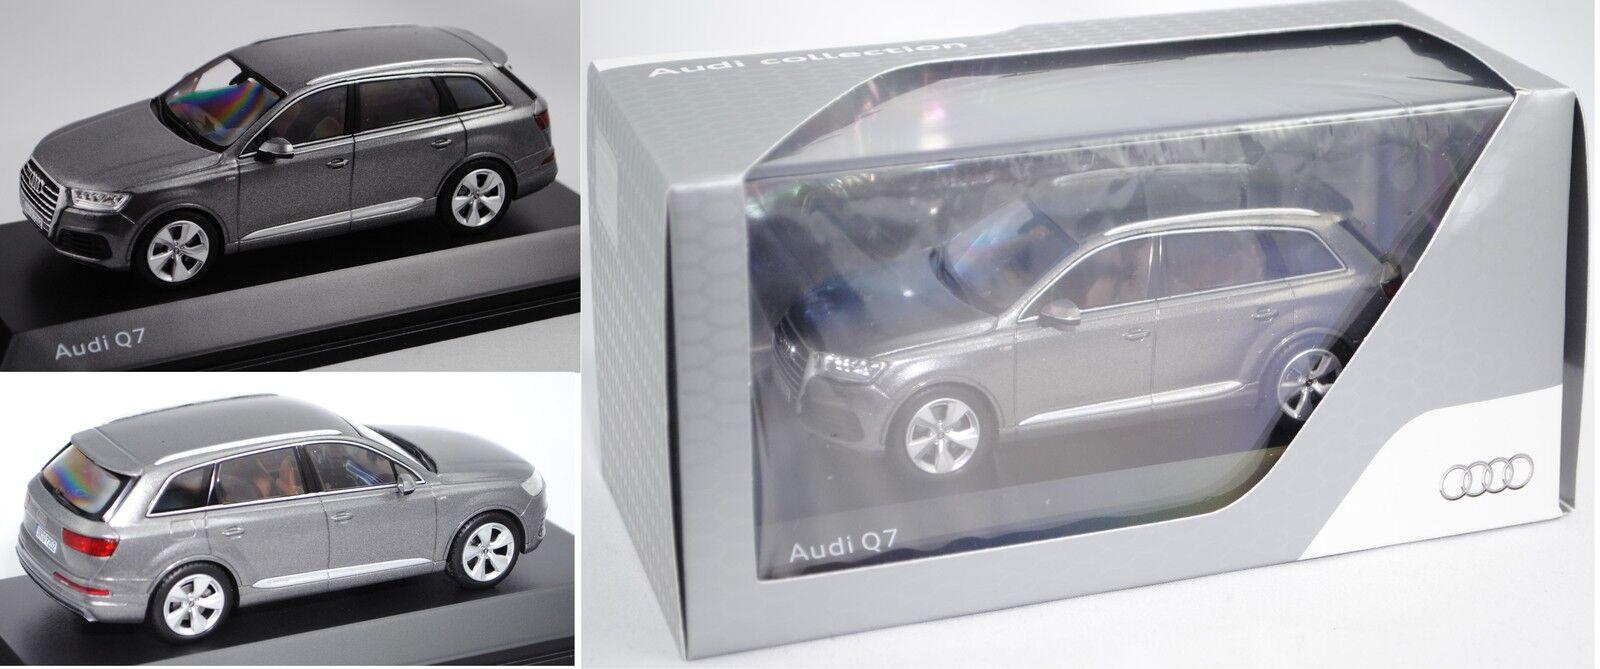 Minimax 5011407633 Audi Q7 (Typ 4M, Modell 2015-), graphitgrey, 1 1 1 43, OVP 2cd90c